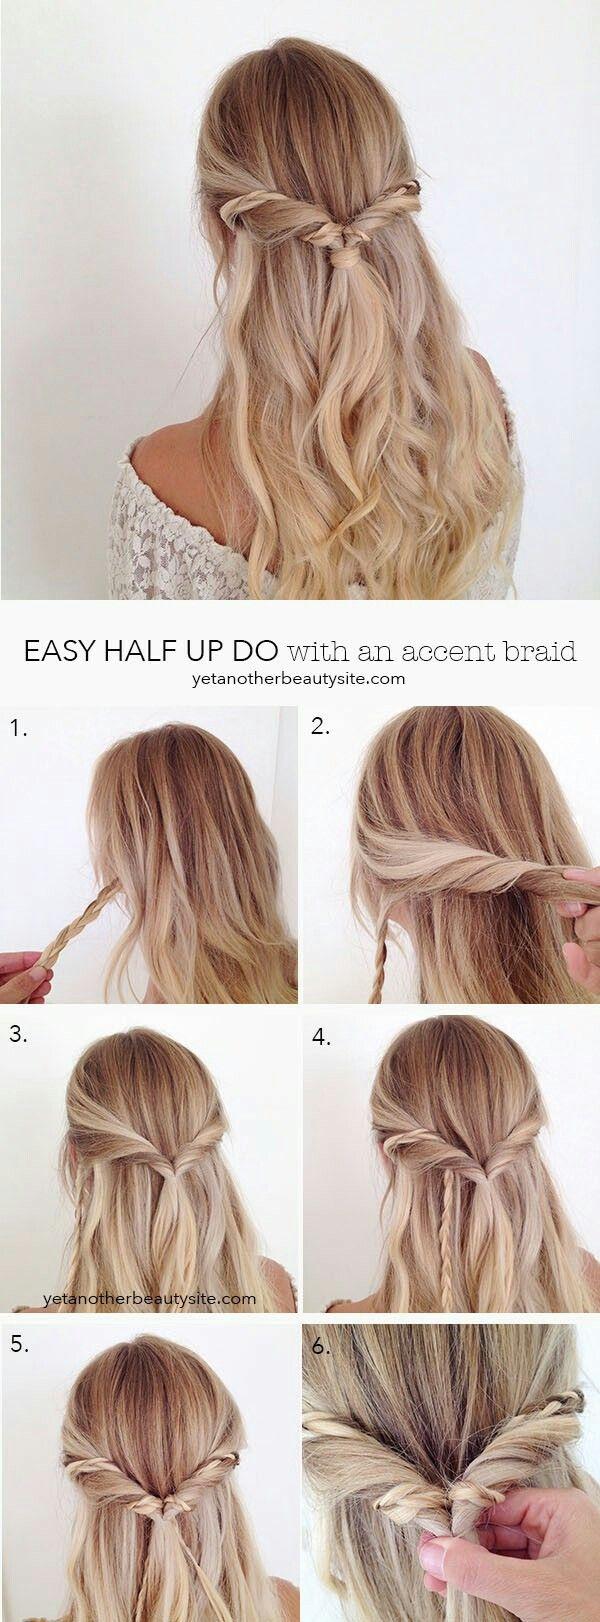 Stupendous 1000 Ideas About Easy Up Hairstyles On Pinterest Dutch Braids Short Hairstyles Gunalazisus